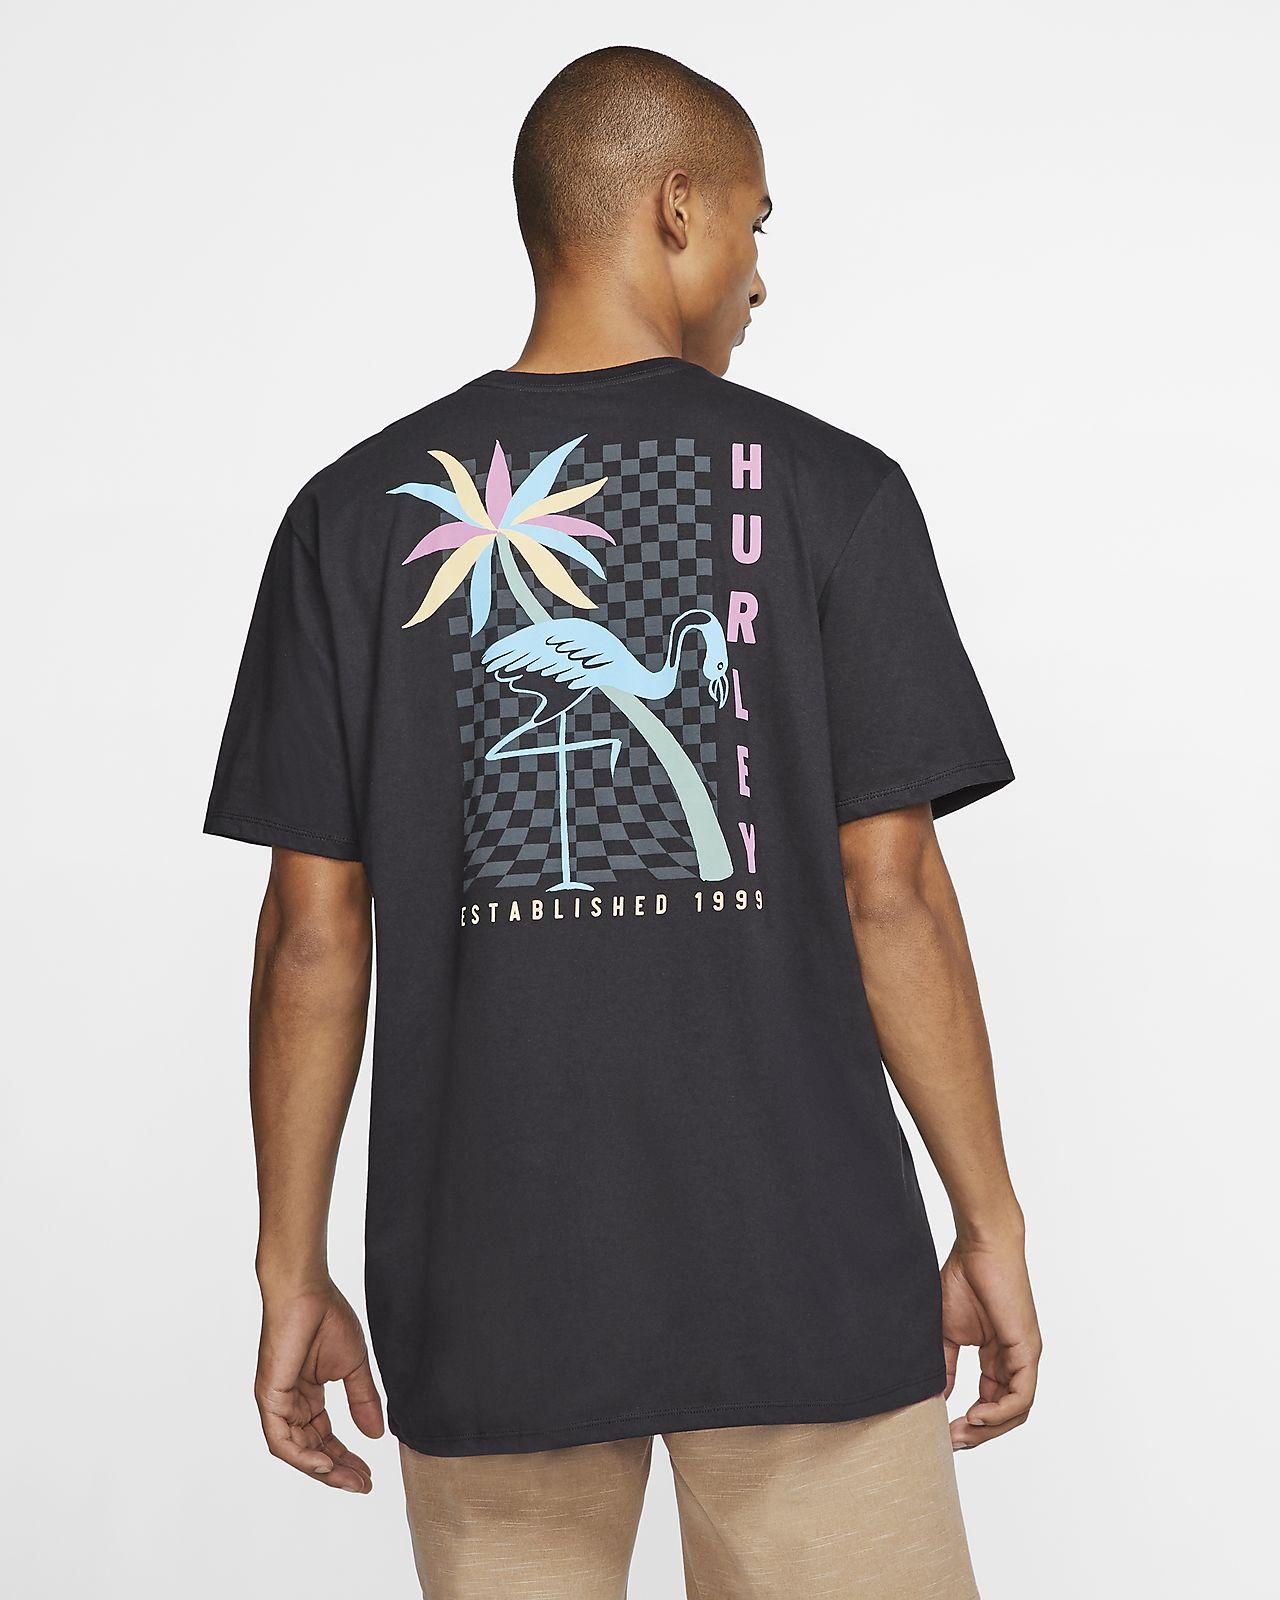 HURLEY MINGOS T-SHIRT - BLACK